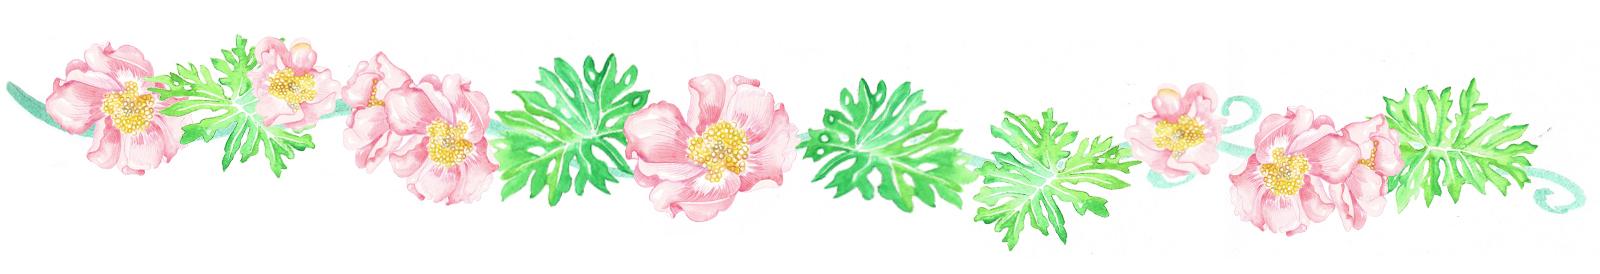 rosa de bayahibe.jpg